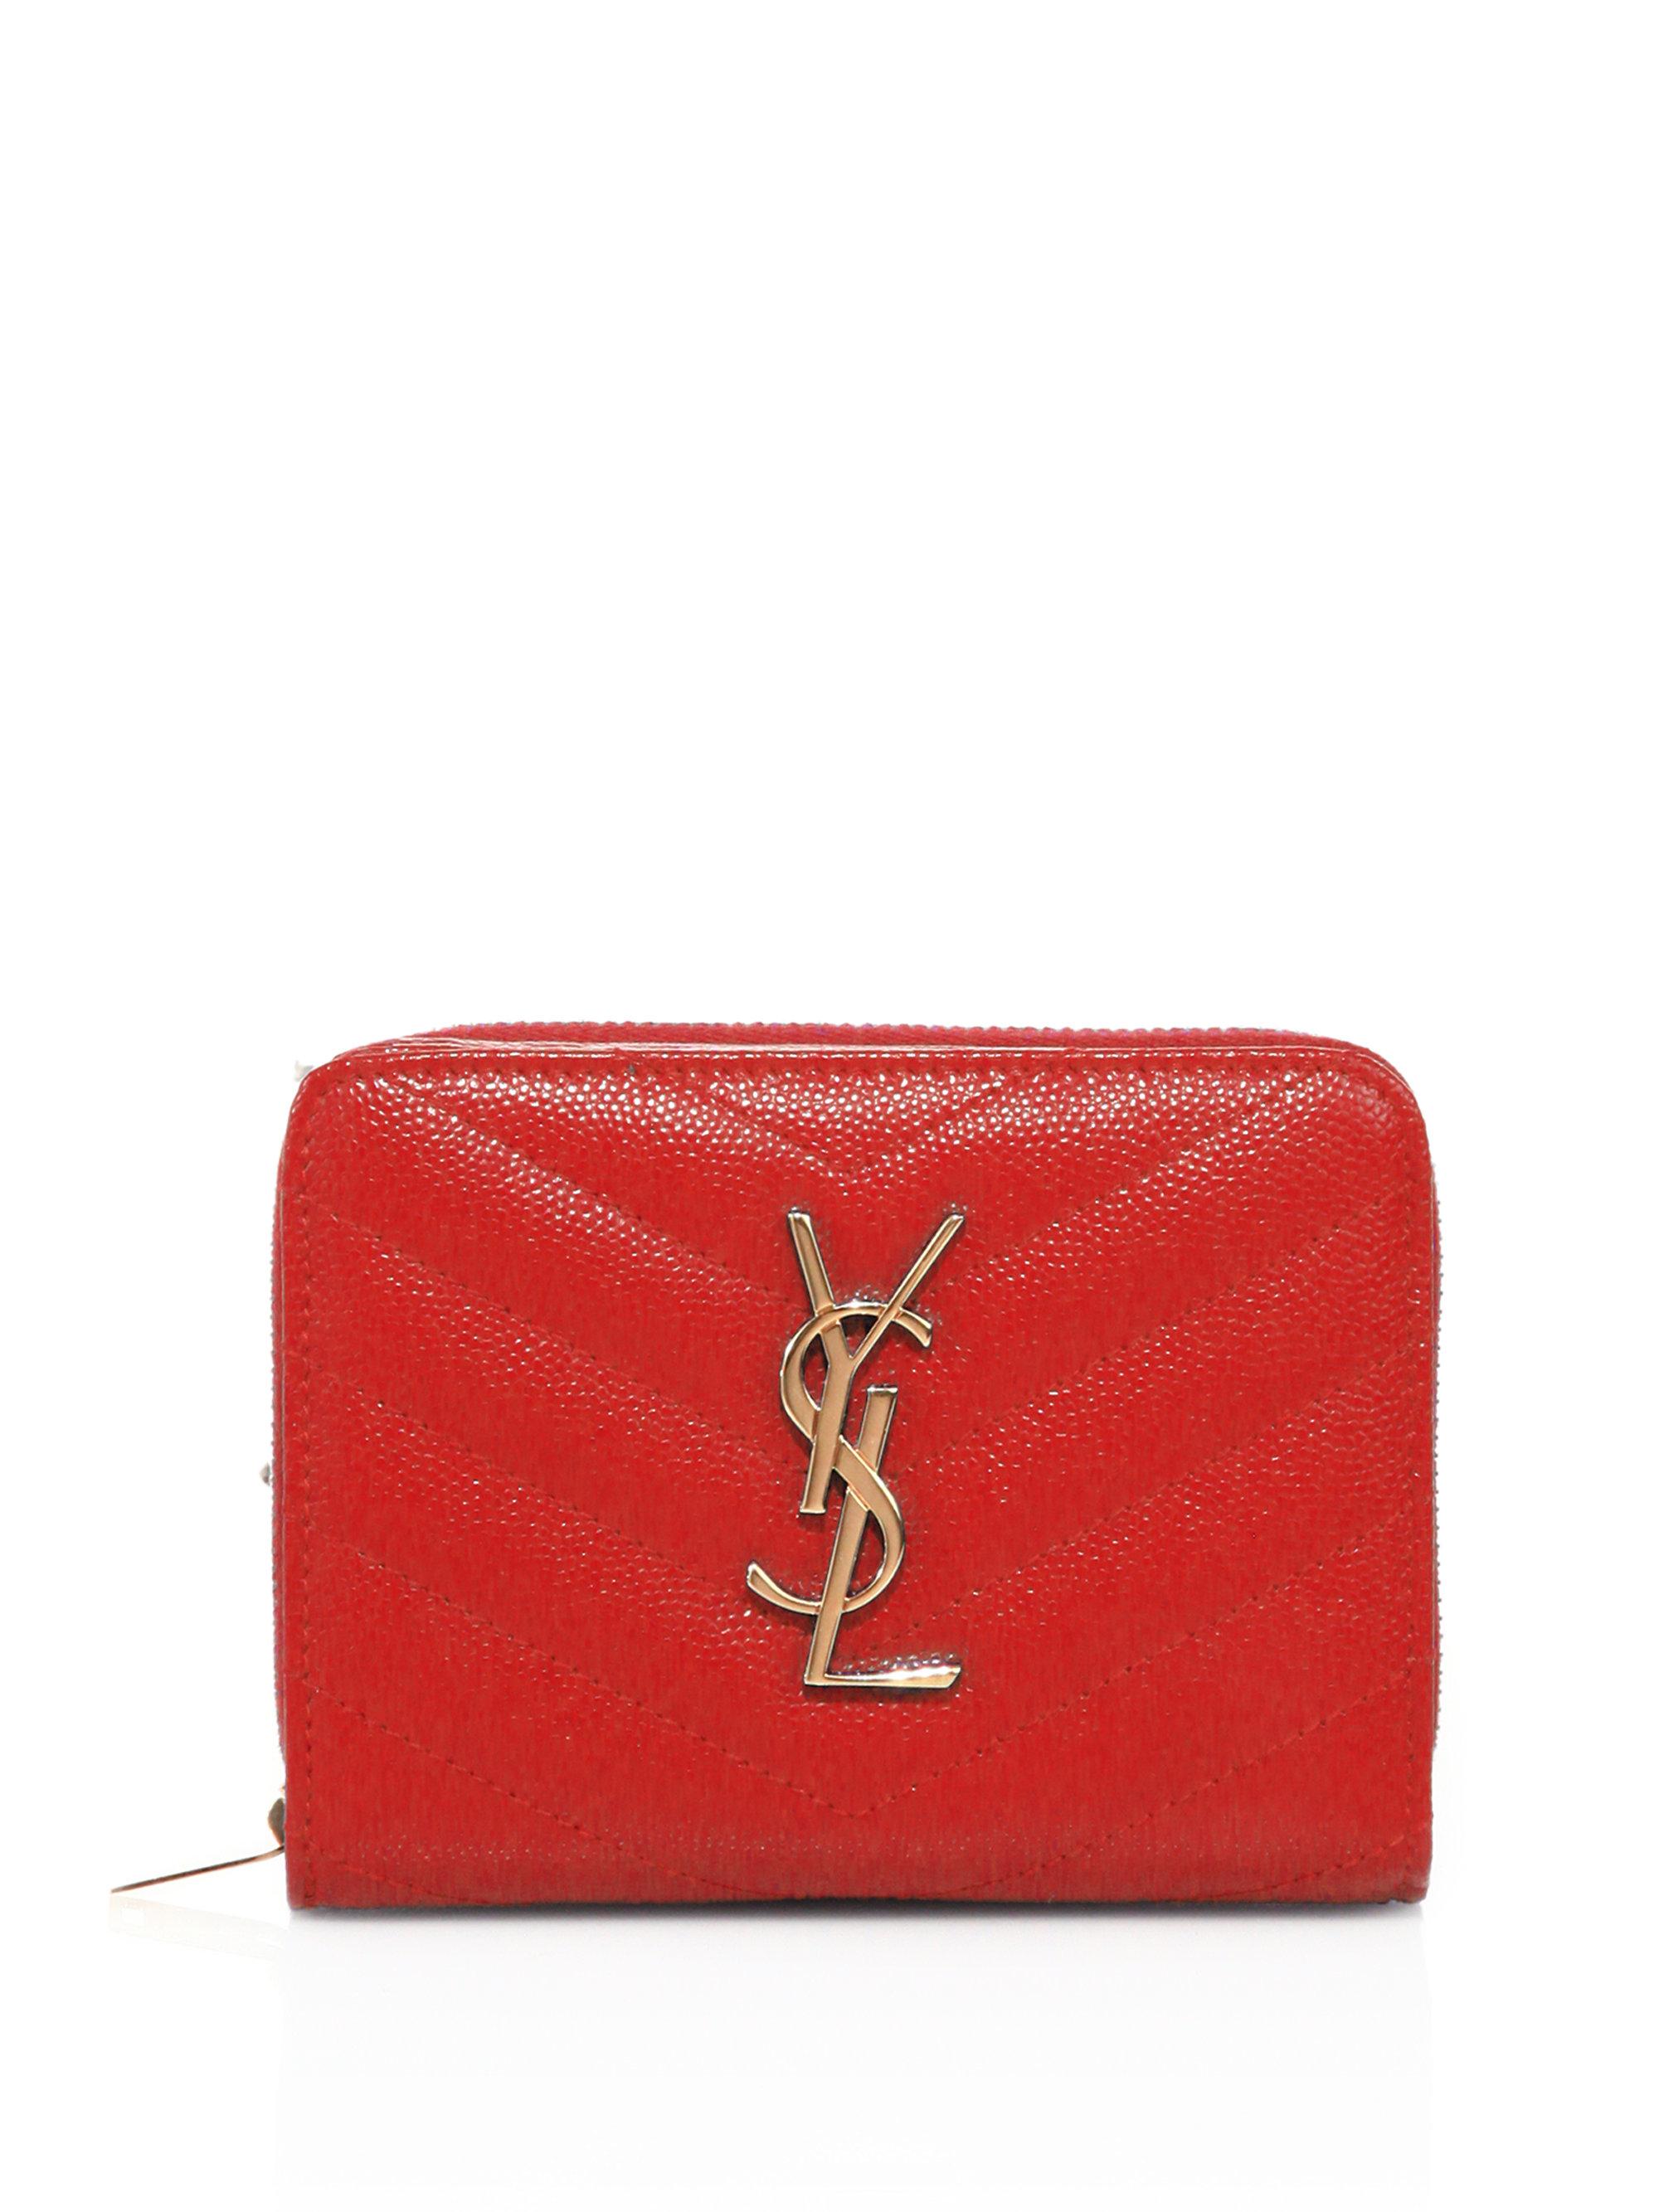 huge handbags for cheap - monogram saint laurent chain wallet in gold metallic grained leather